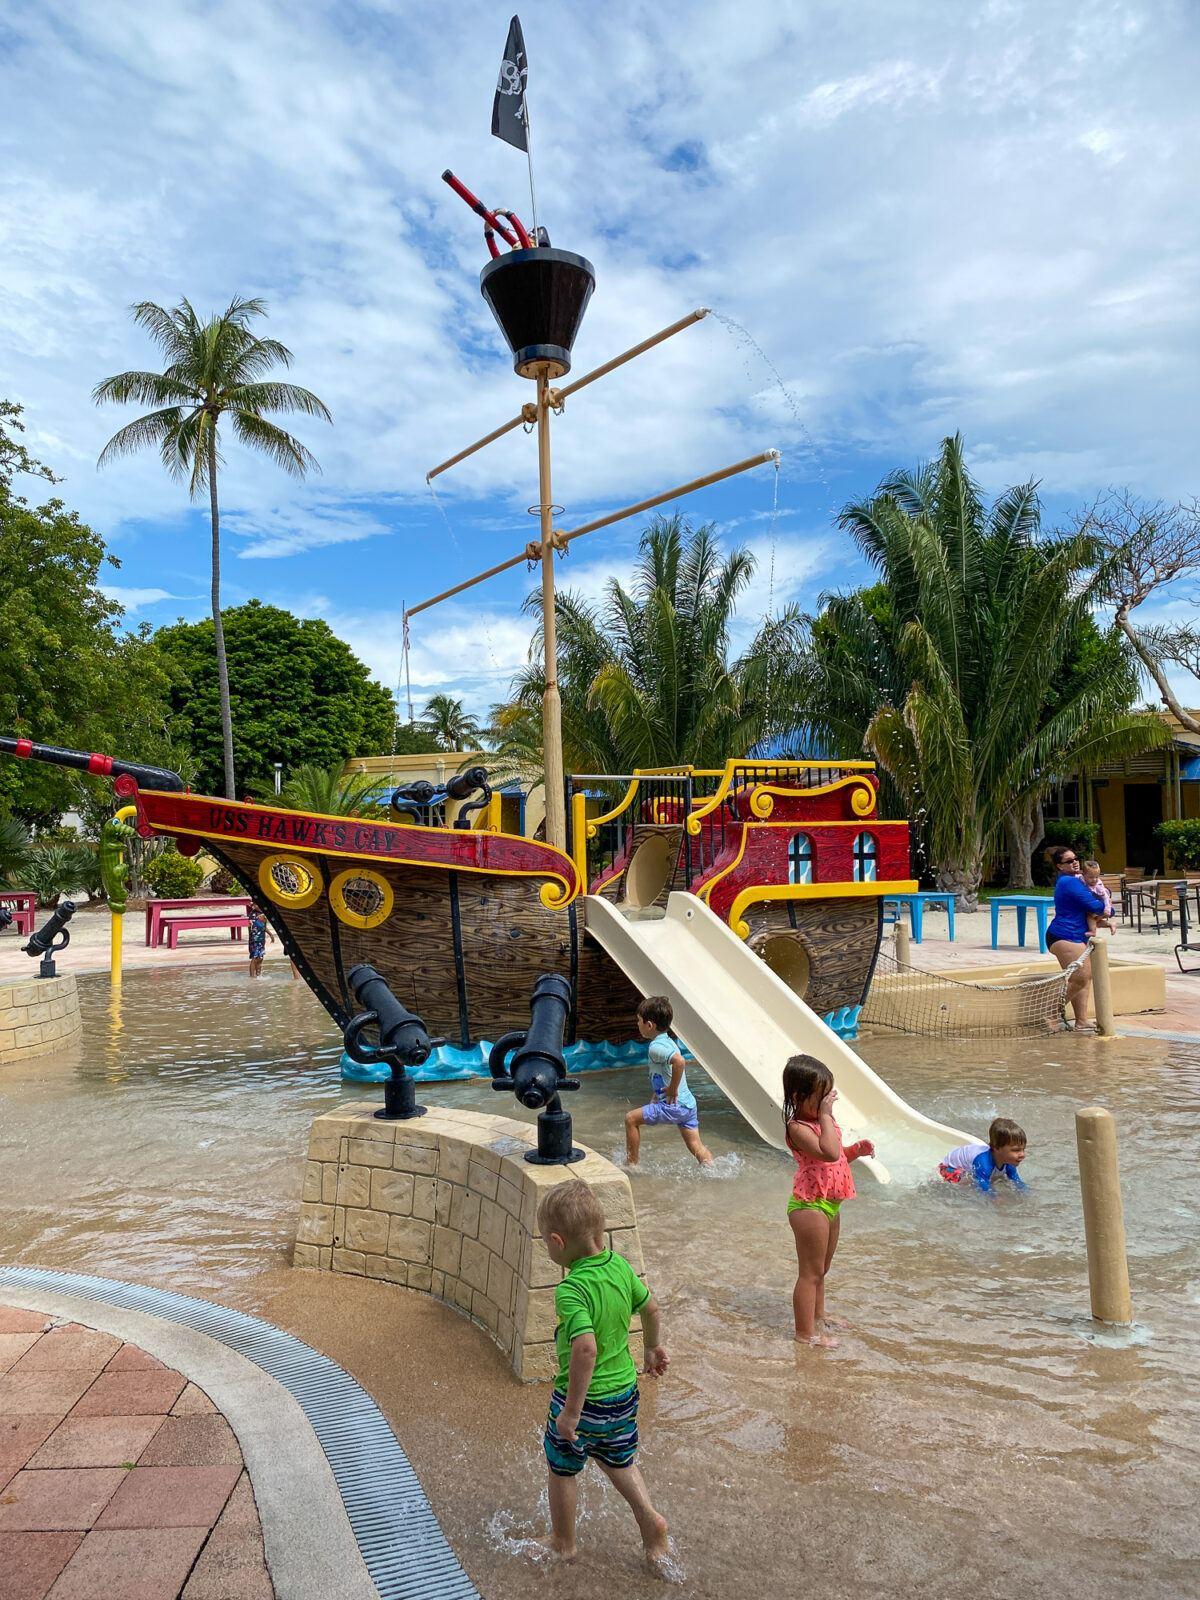 Pirate Ship splash pool at Hawks Cay Resort with kids